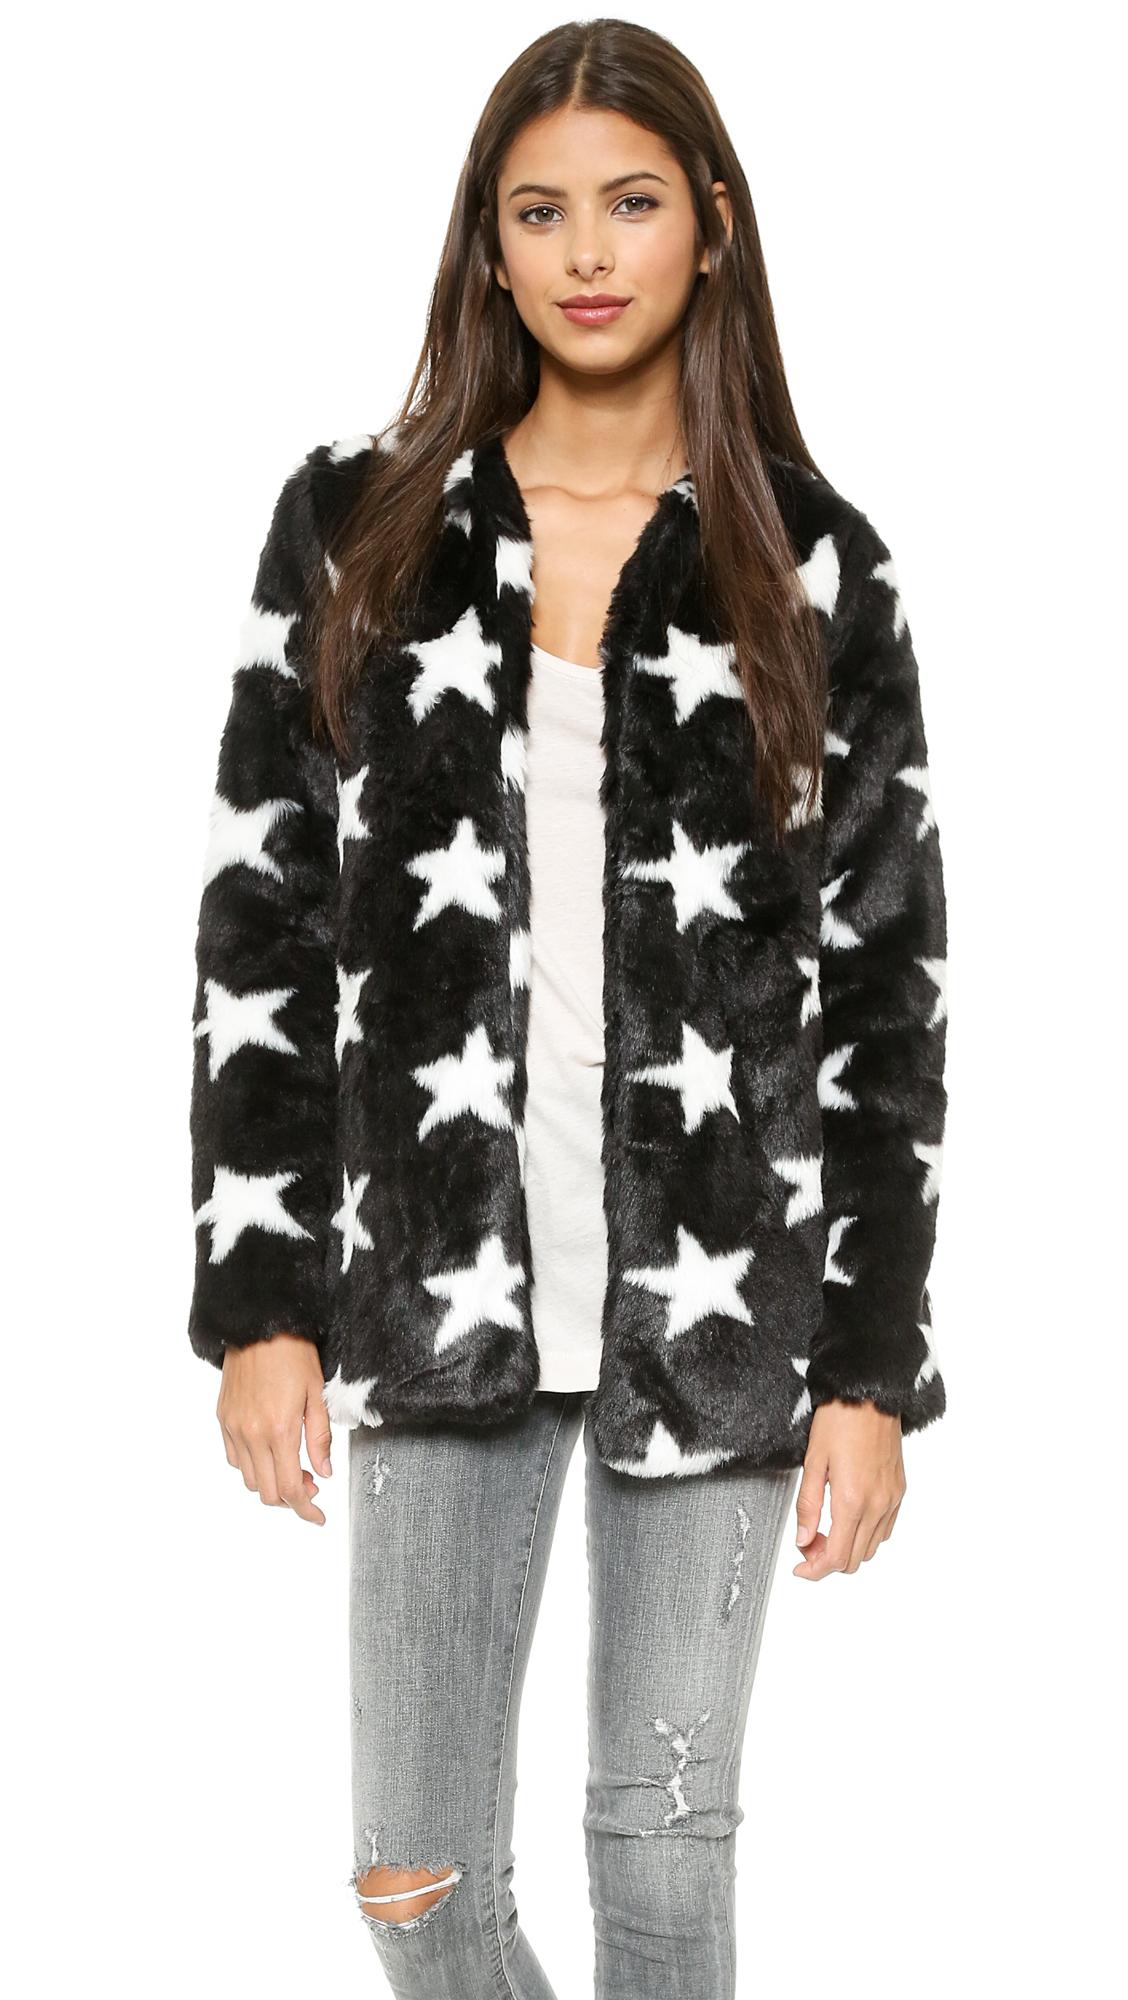 Lyst Re Named Star Faux Fur Coat Black White In Black